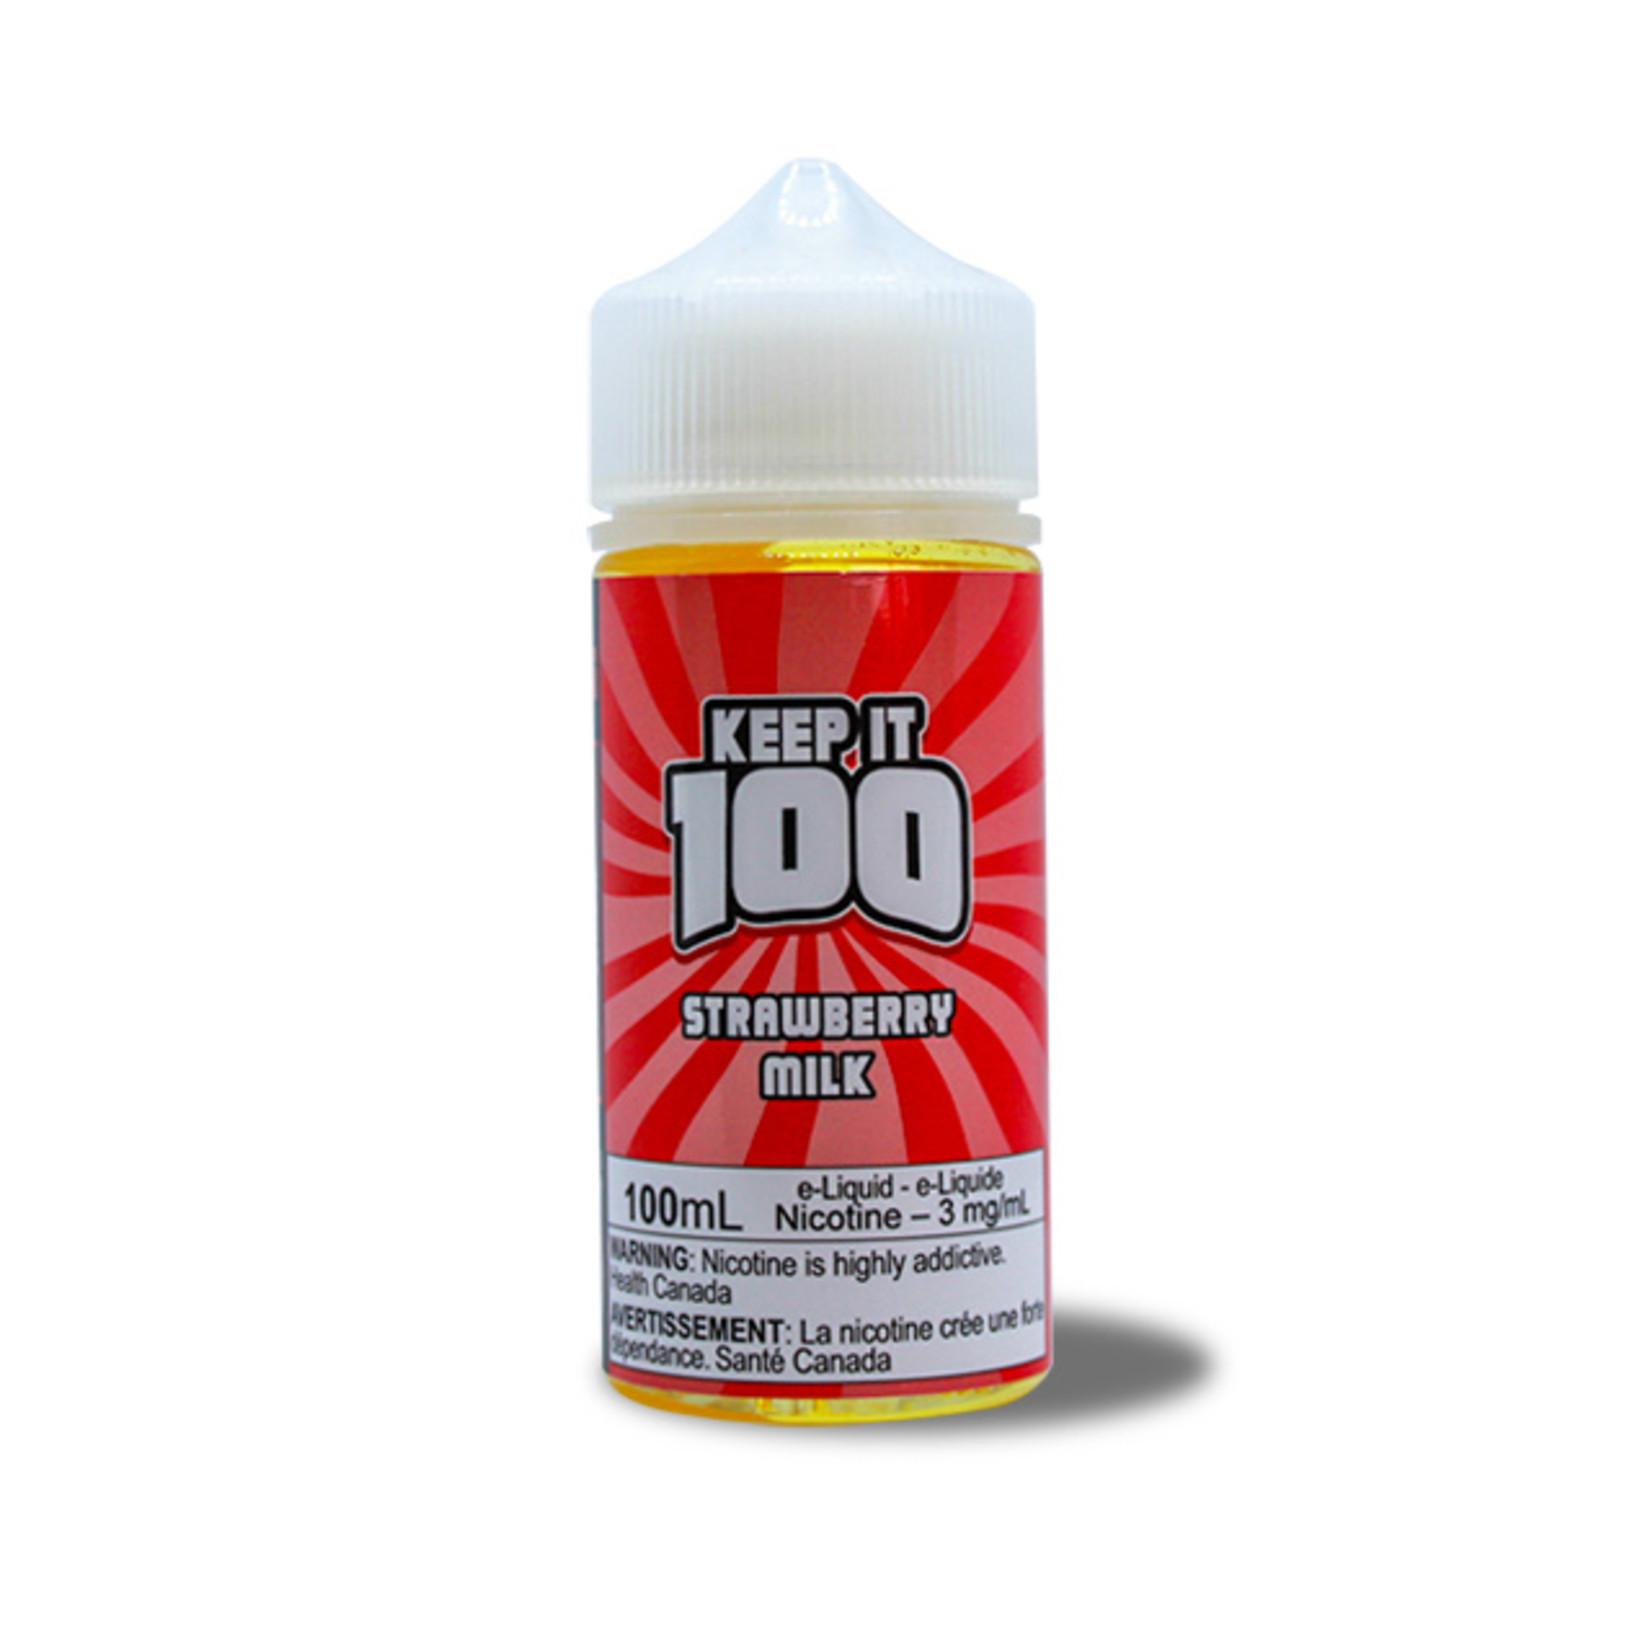 Keep It 100 Strawberry Milk